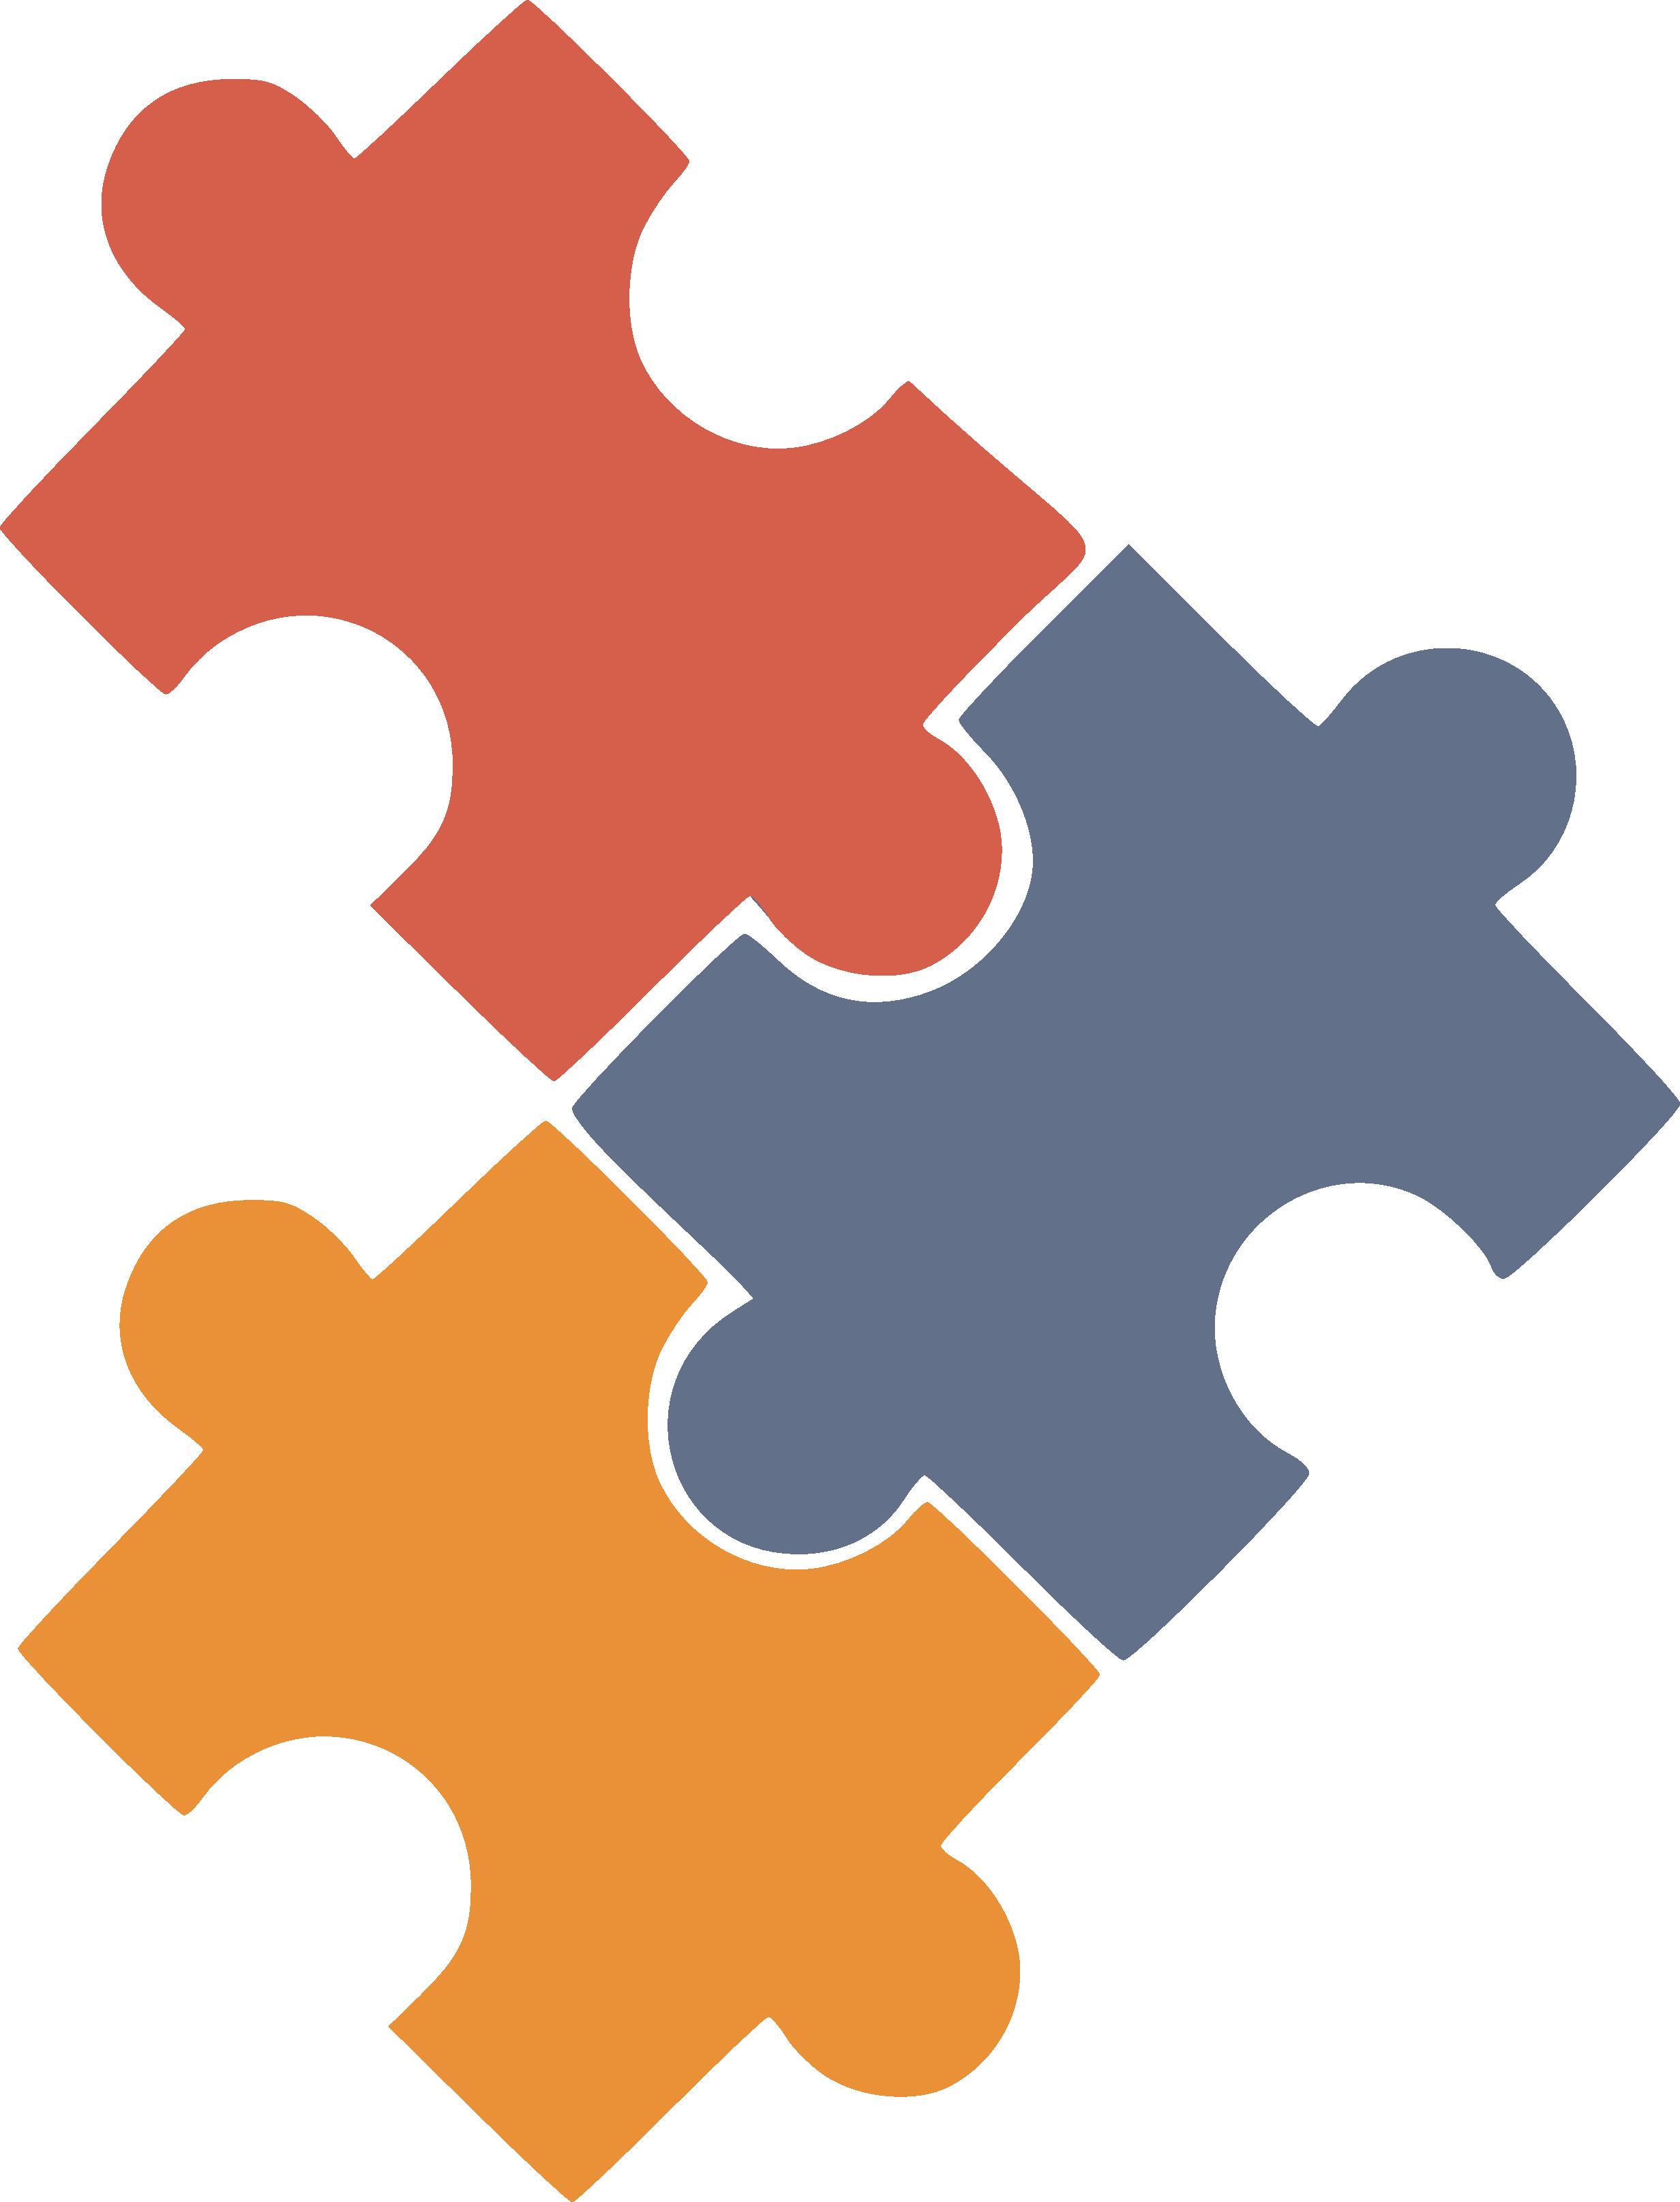 Logos mit sangam the. Teamwork clipart puzzle